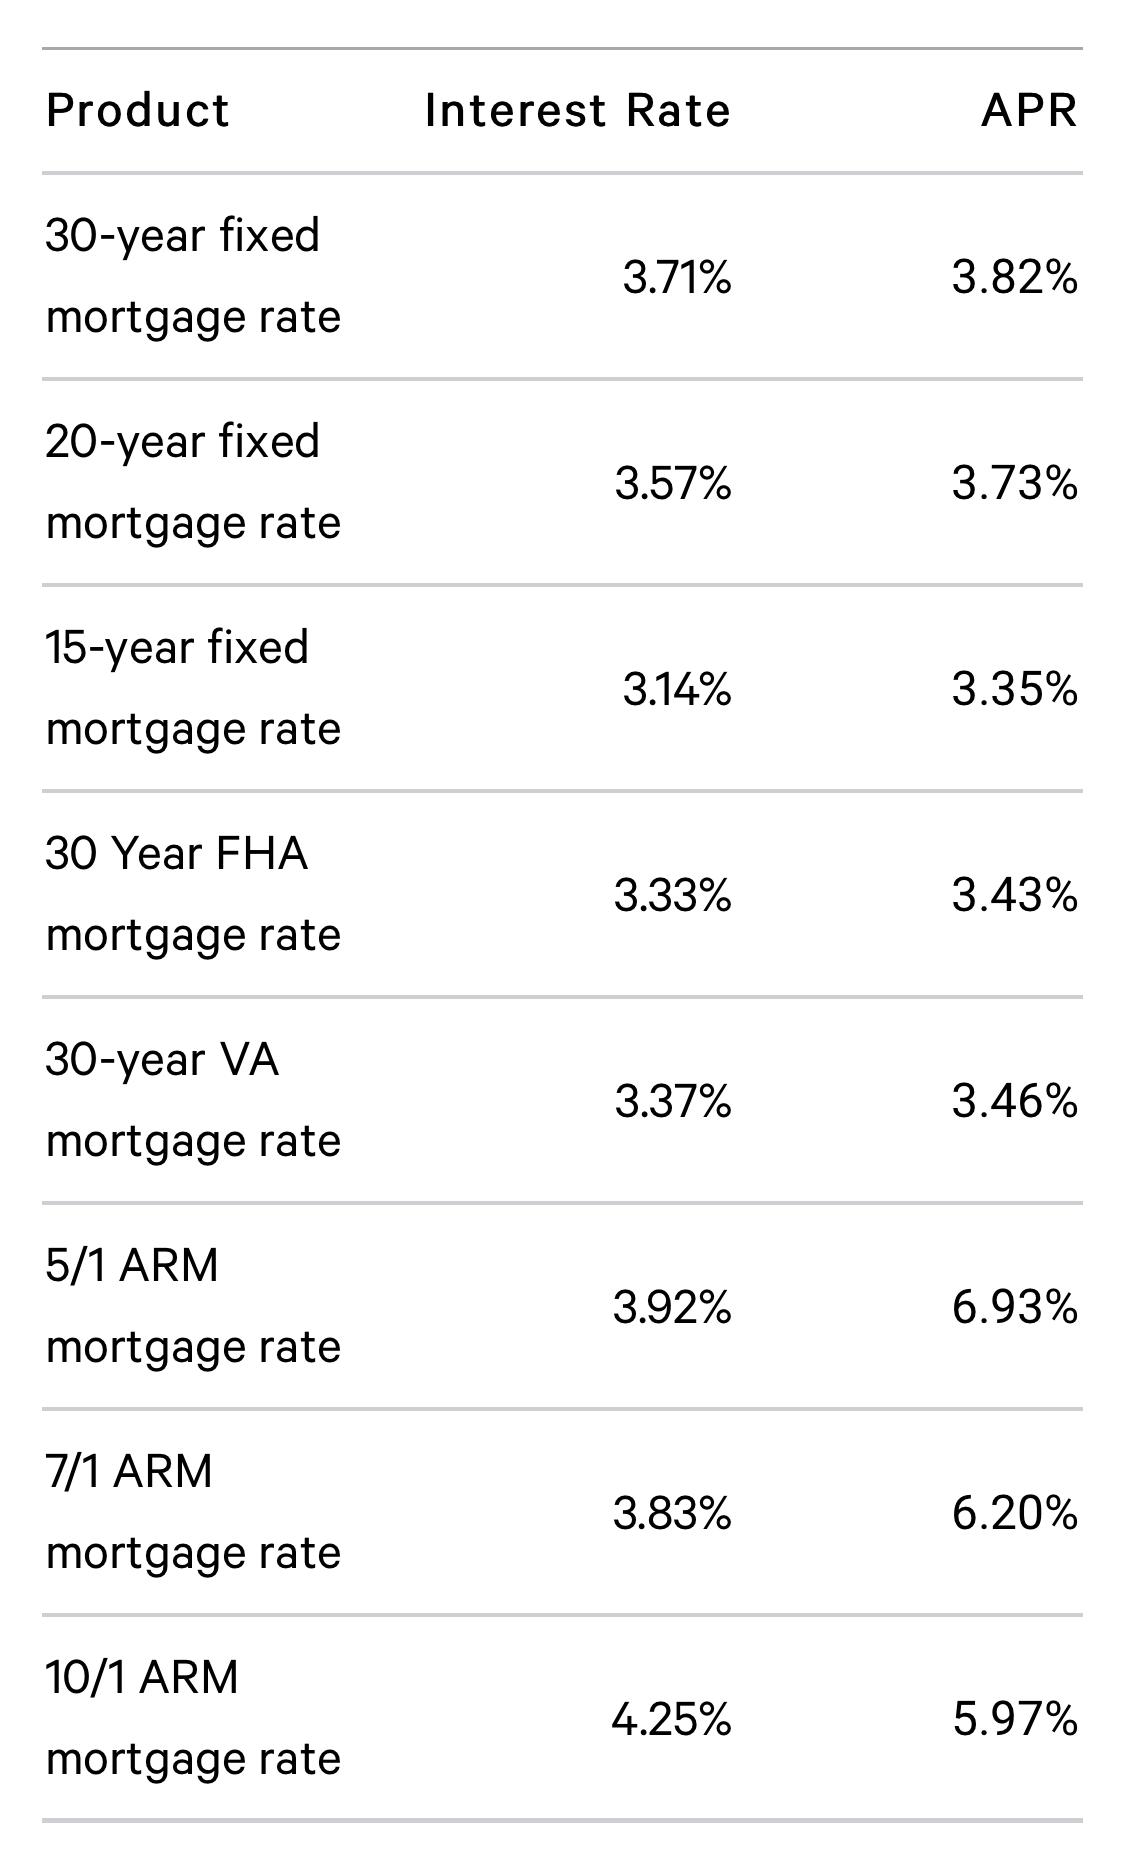 Queens Real Estate Market Report AUGUST 2019 - Interest Rates